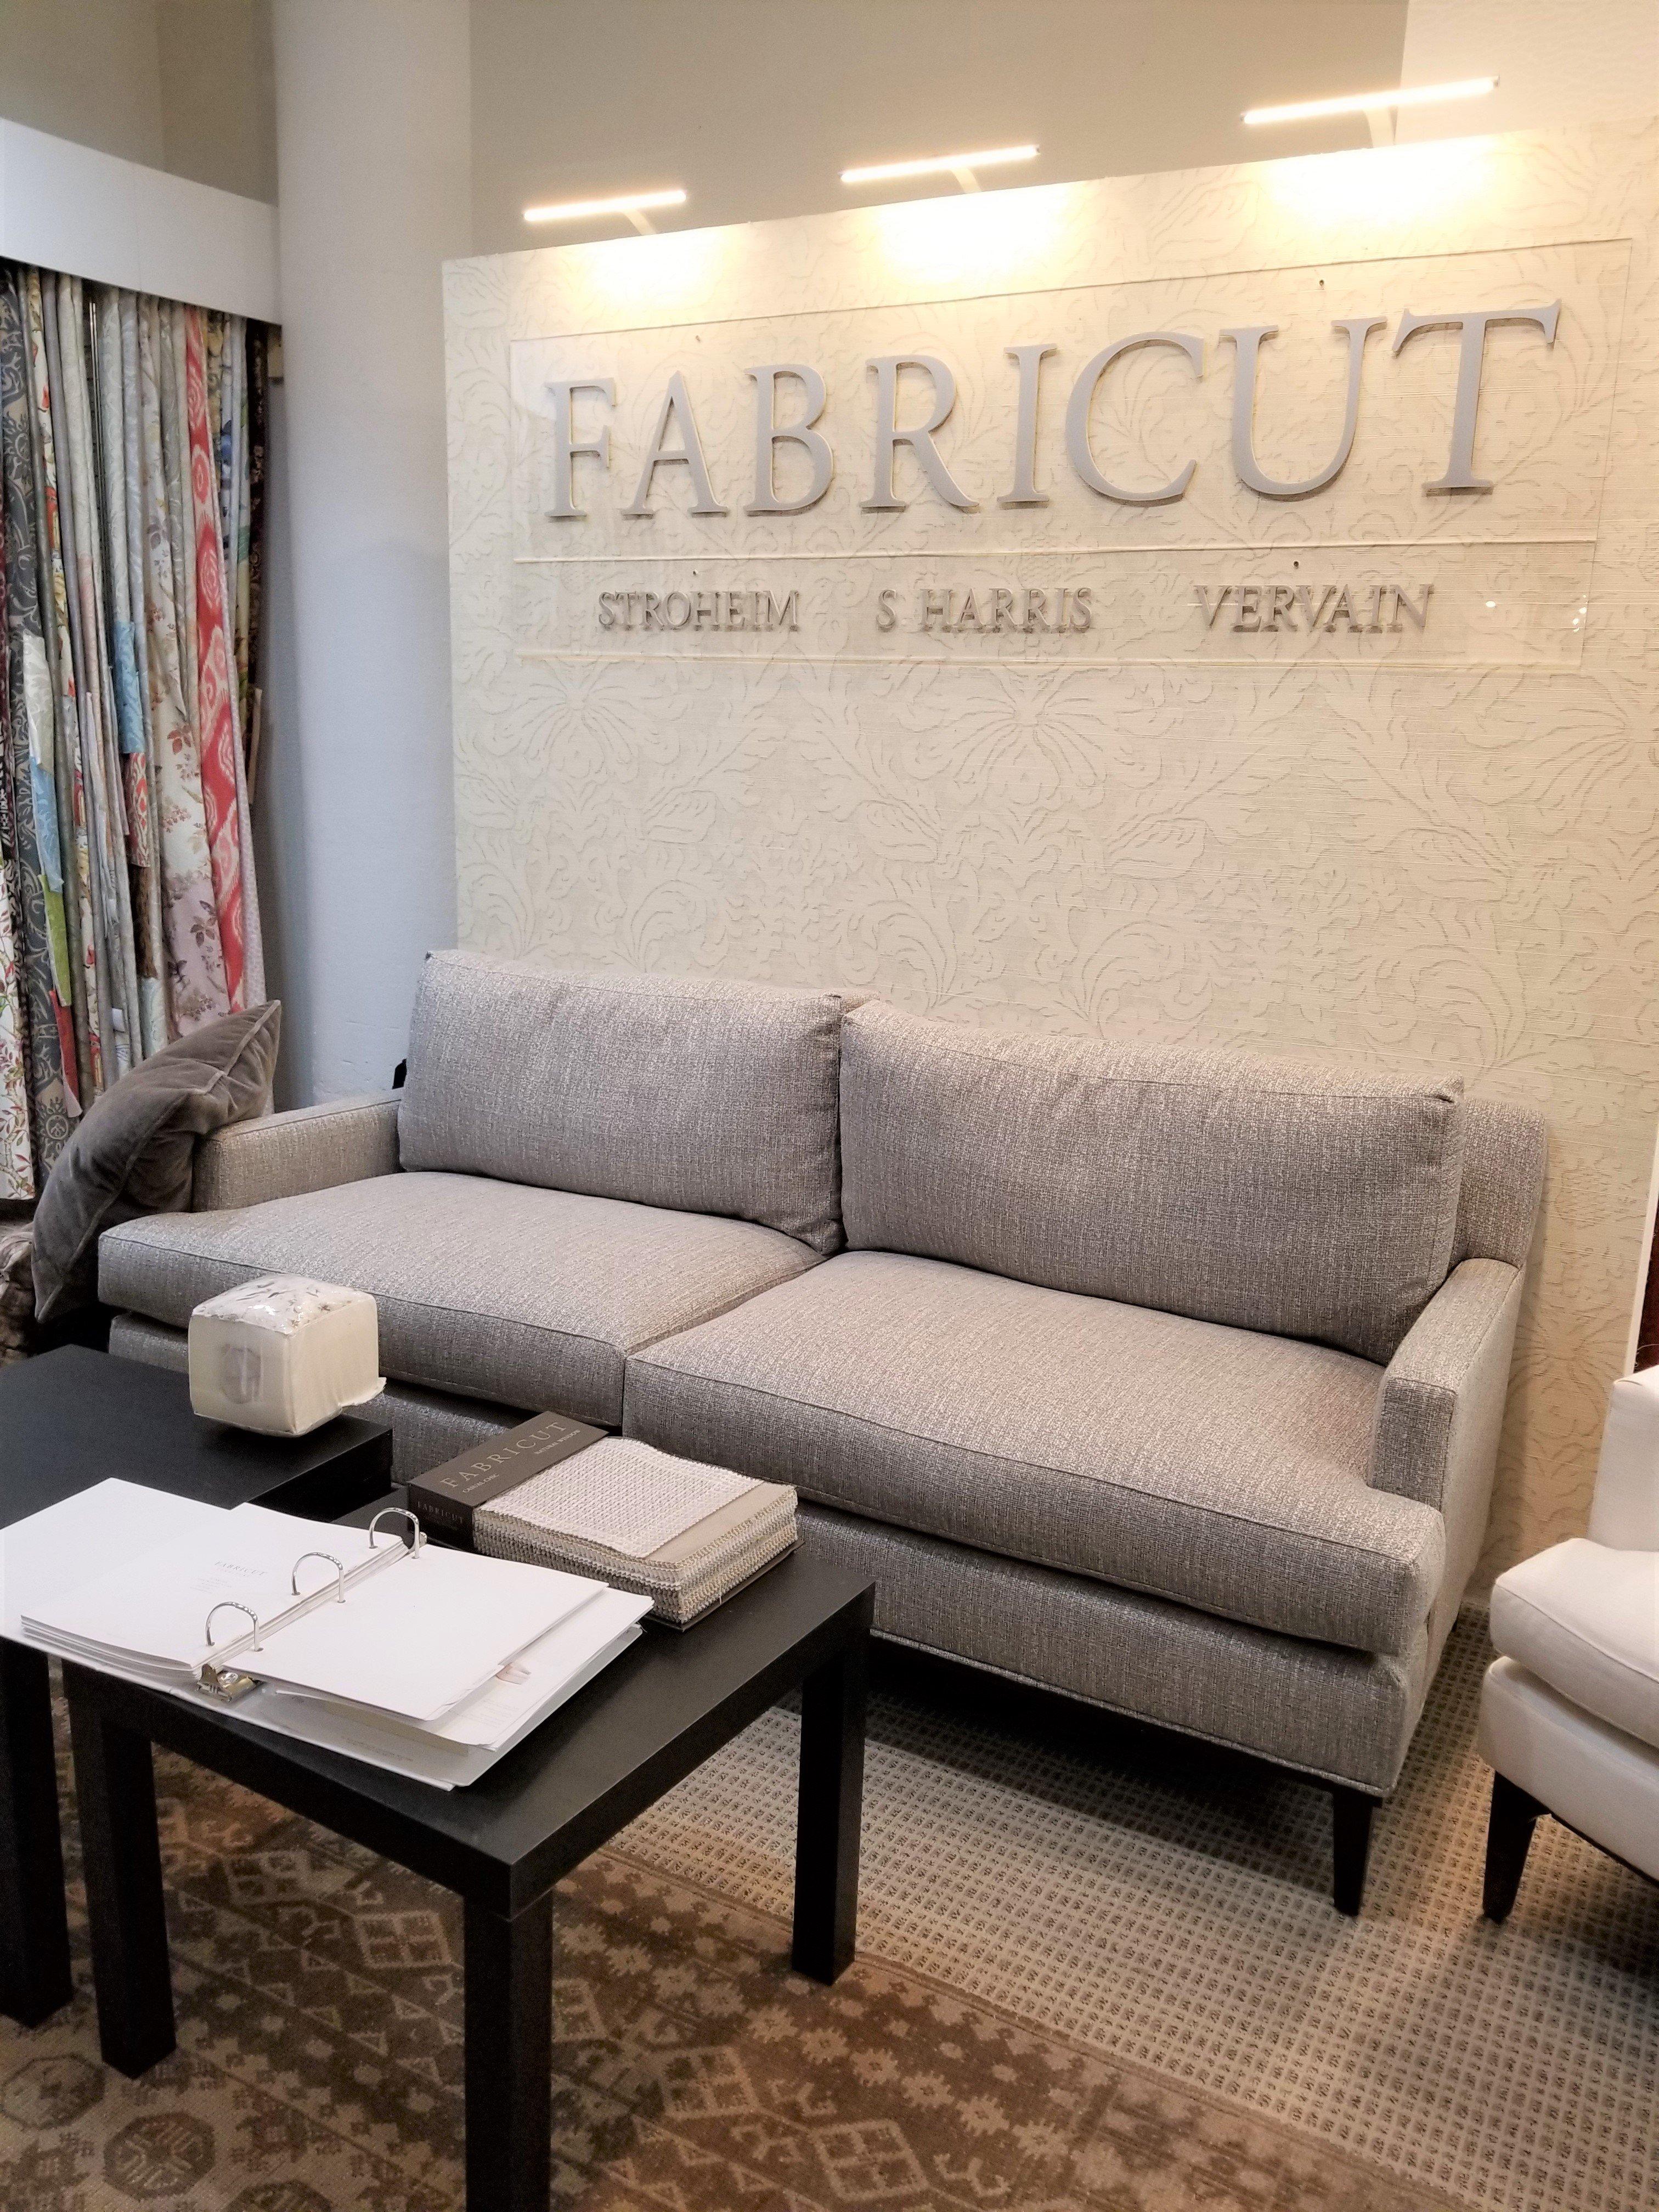 Fabricut custom furniture